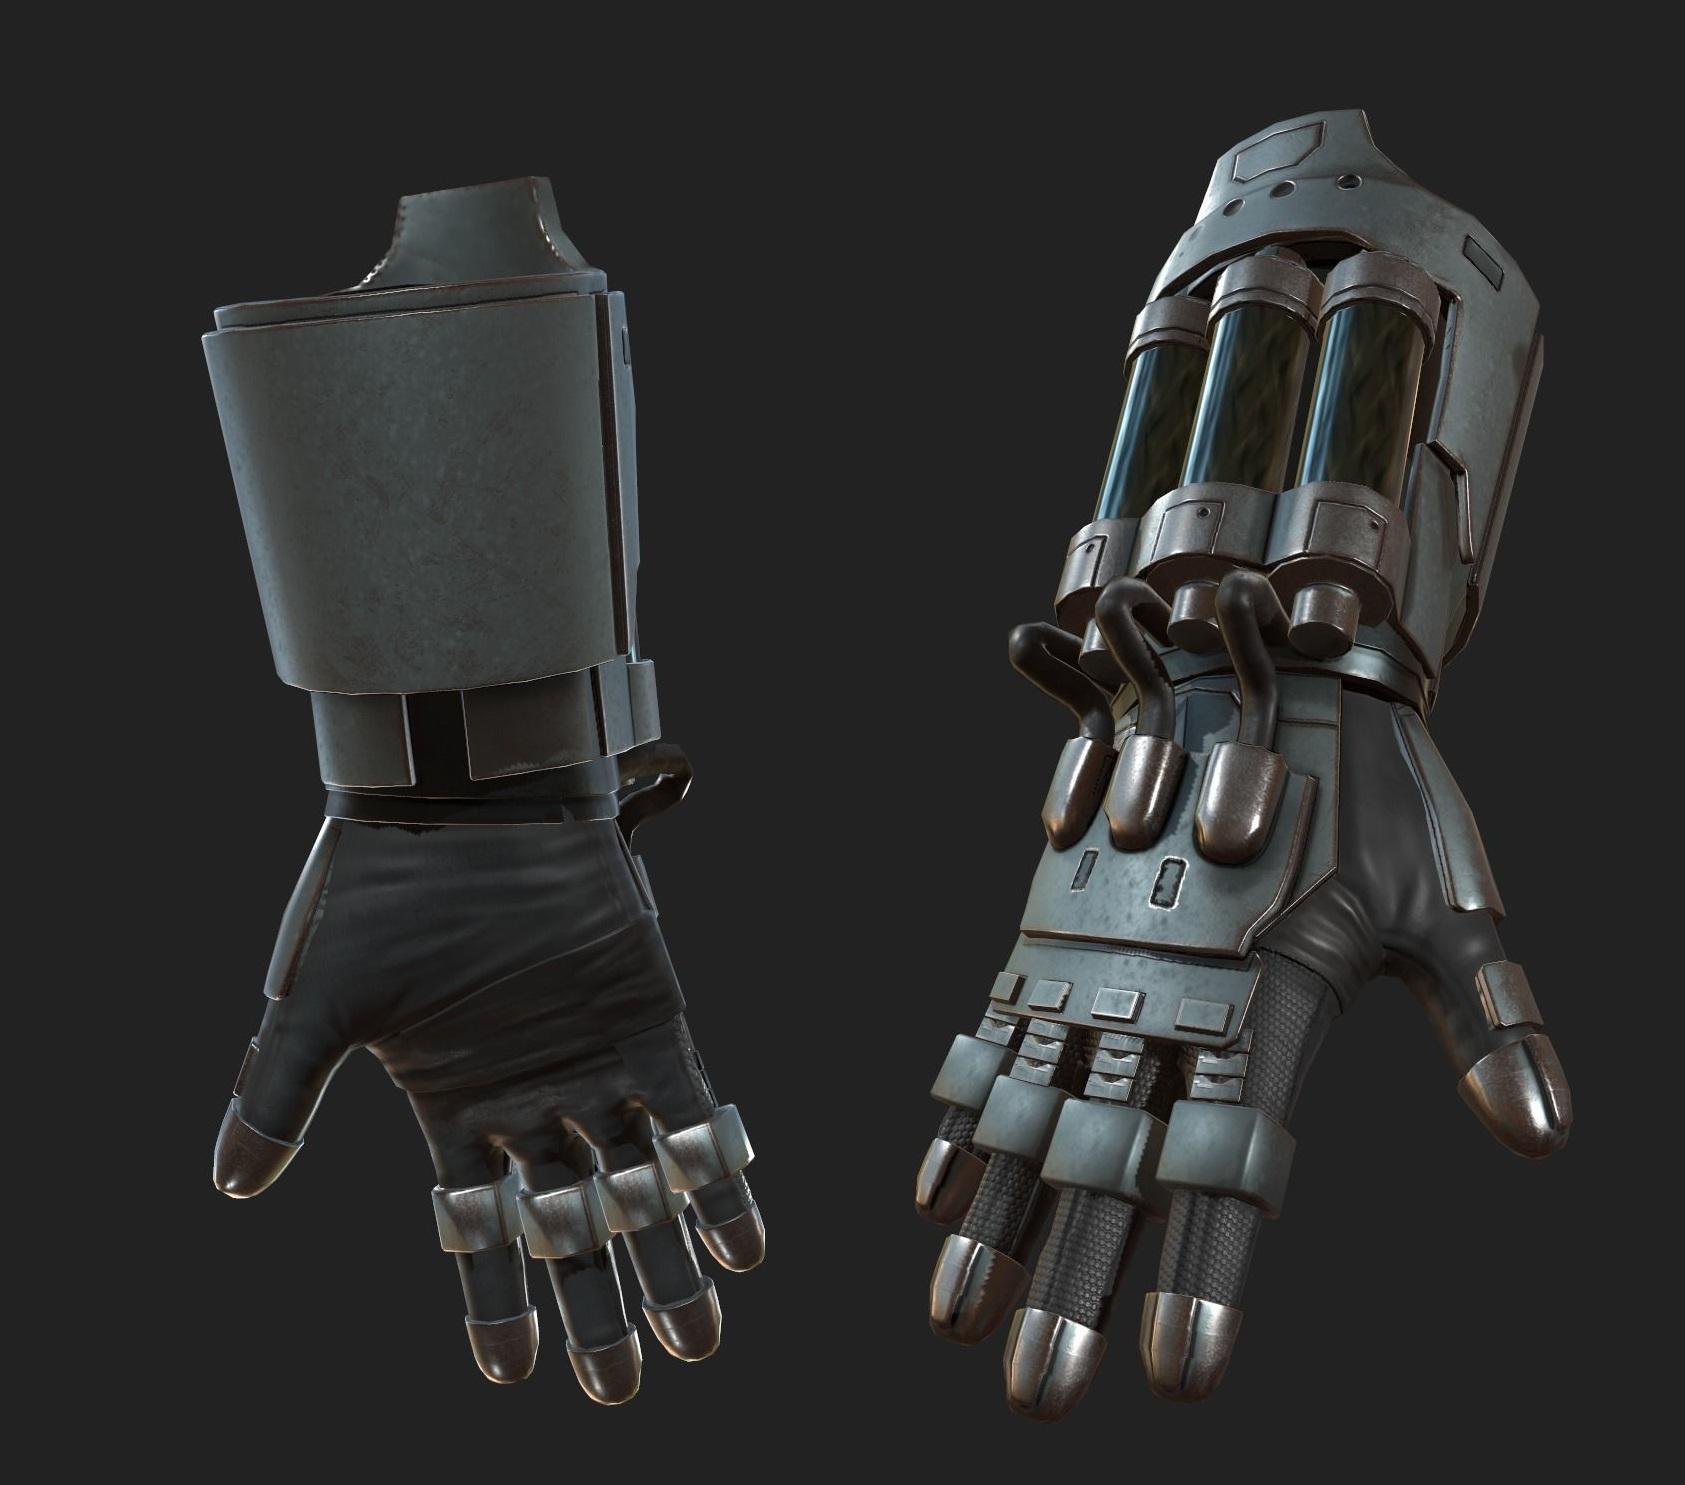 gloves-scifi-ver-8-3d-model-low-poly-fbx (1) | 3d artist